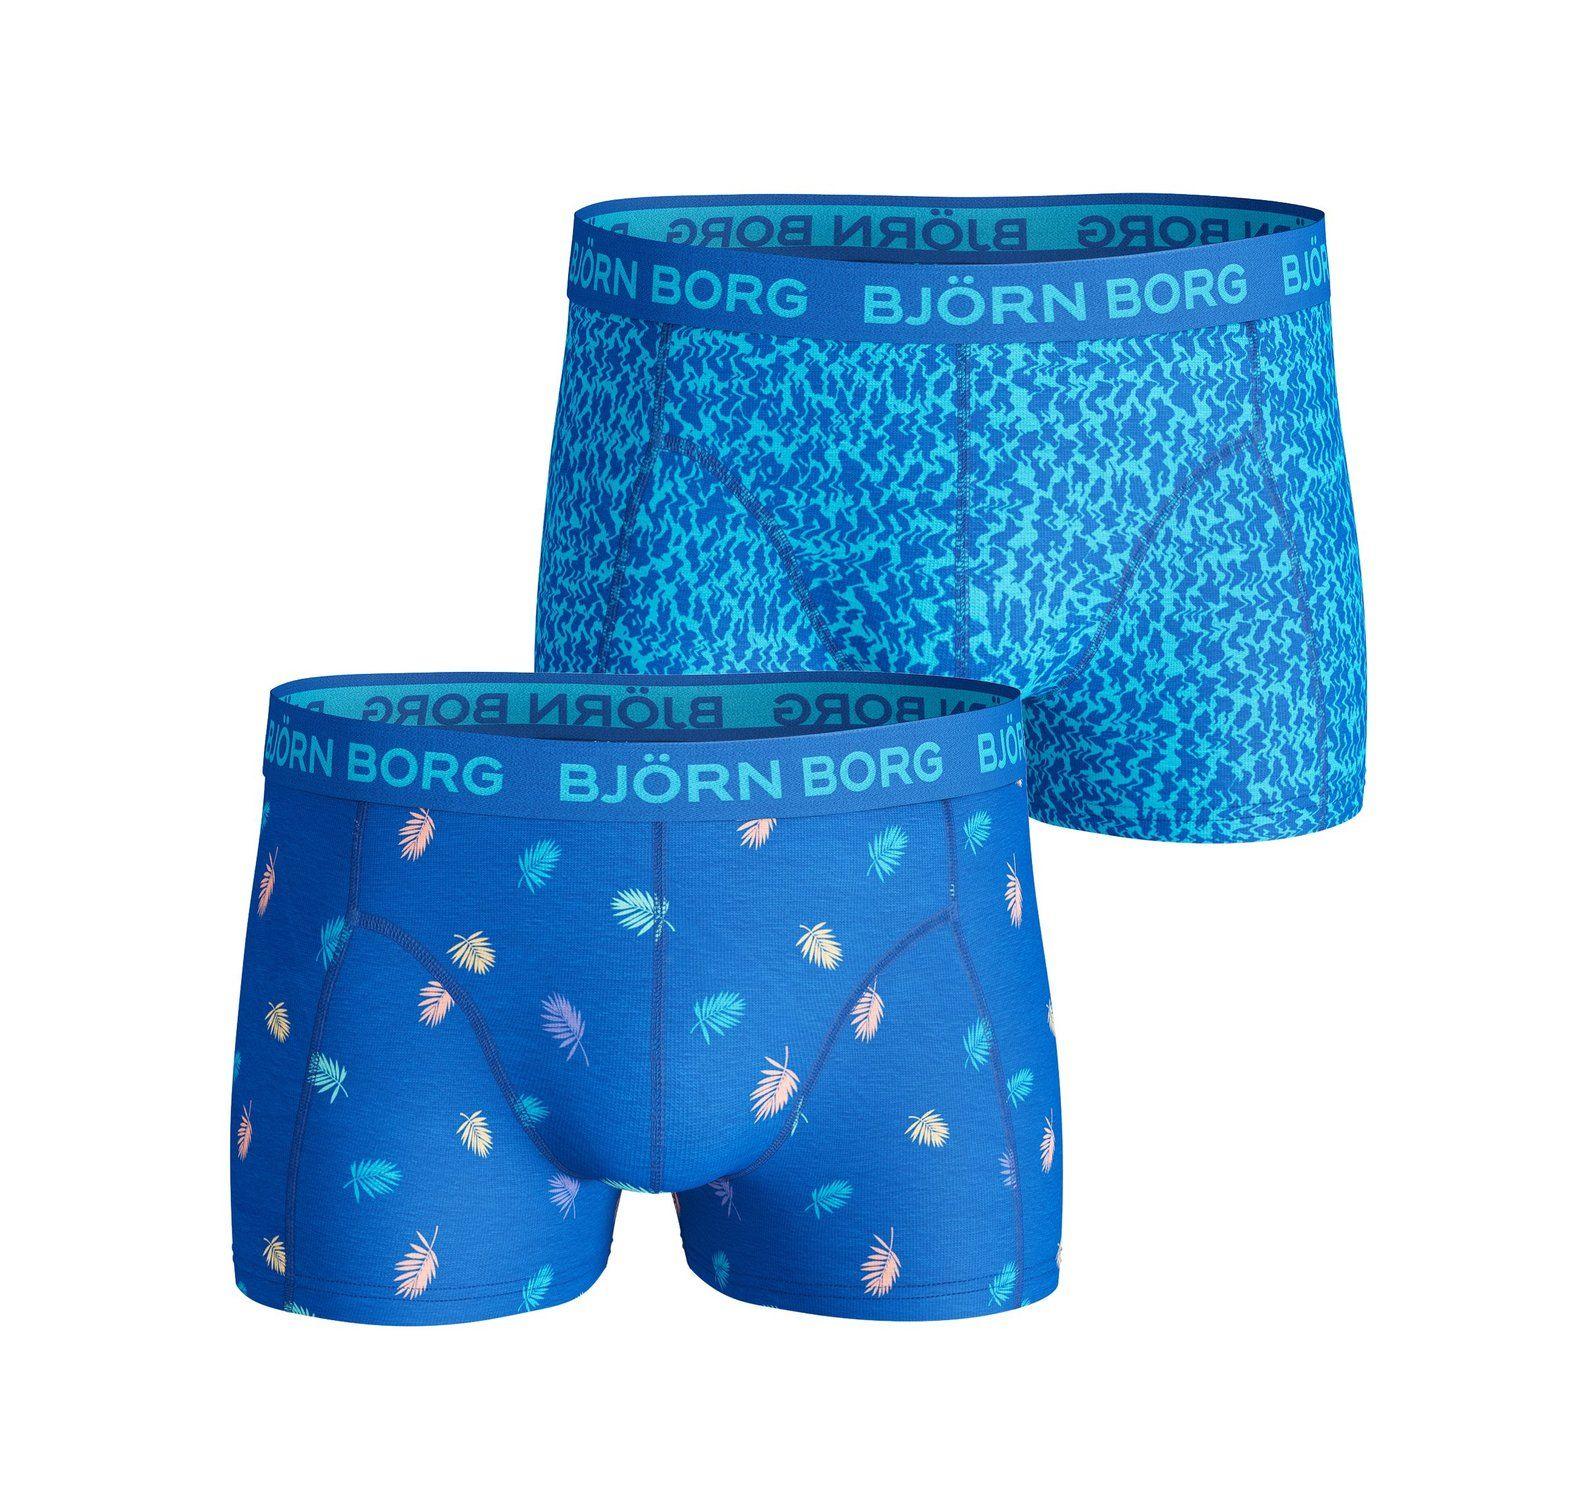 2p Short Shorts Bb Multi Palm, Directoire Blue, Xs,  Björn Borg